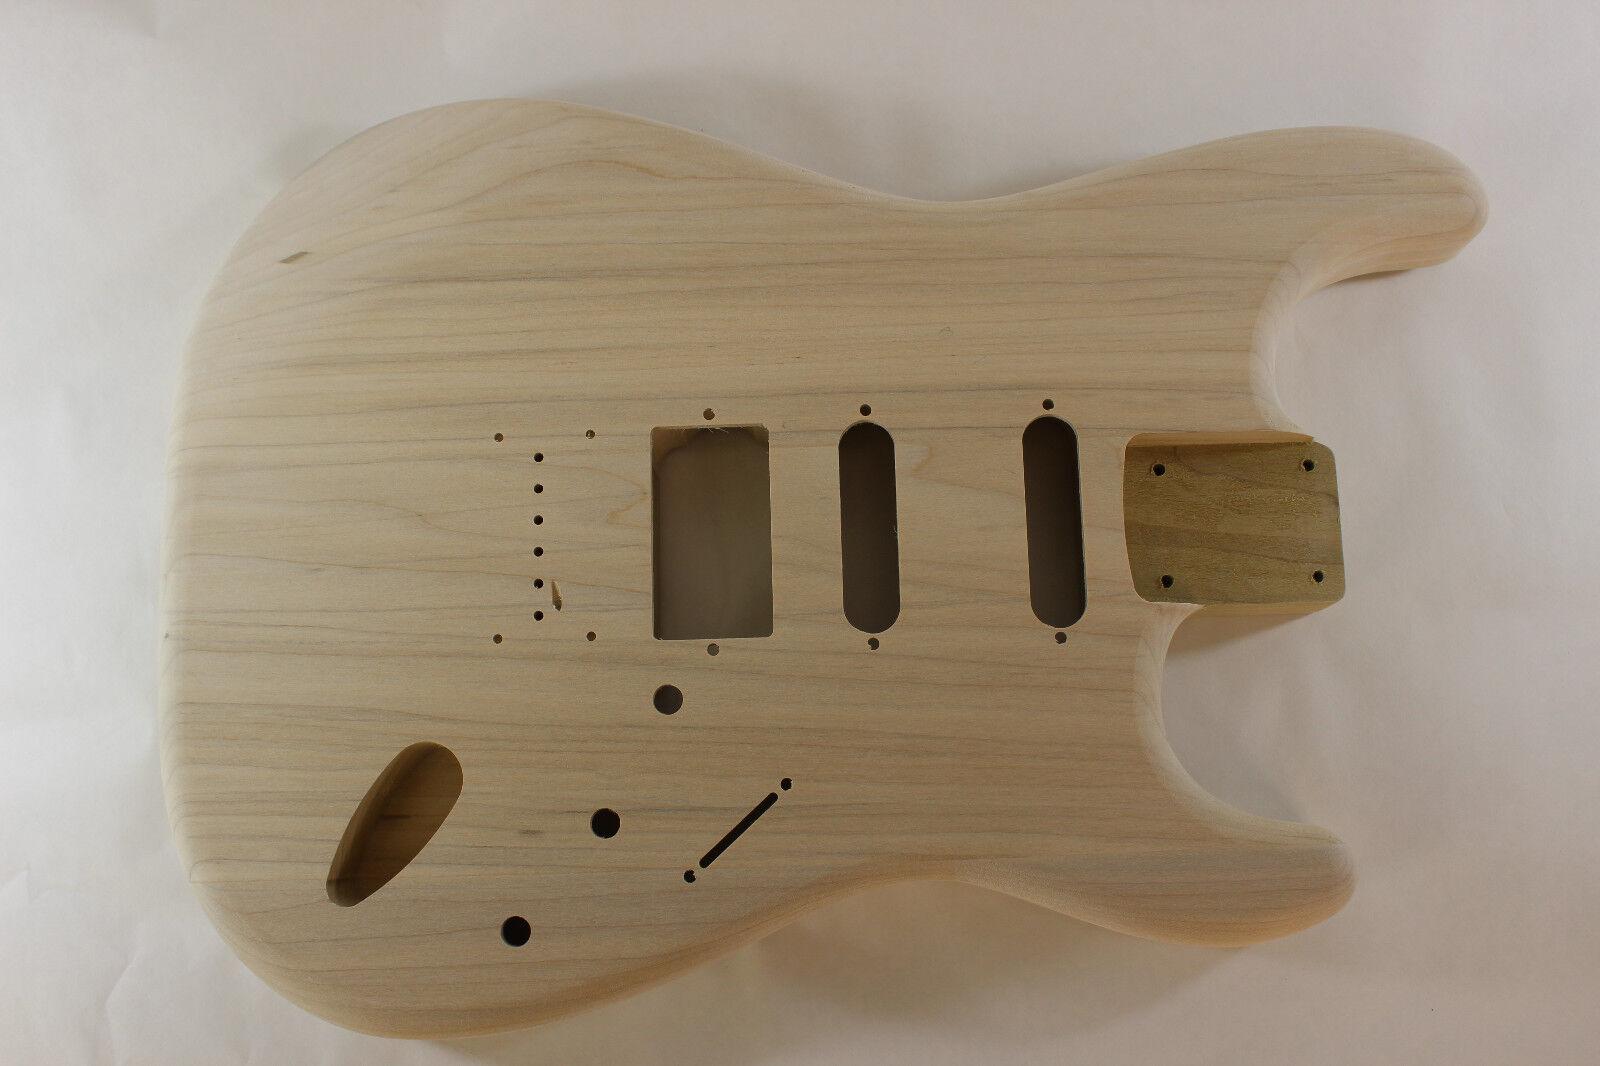 Álamo Hardtail HSS guitarra de de de cuerpo-se adapta a Fender Strat Stratocaster Cuello P491  venta con alto descuento